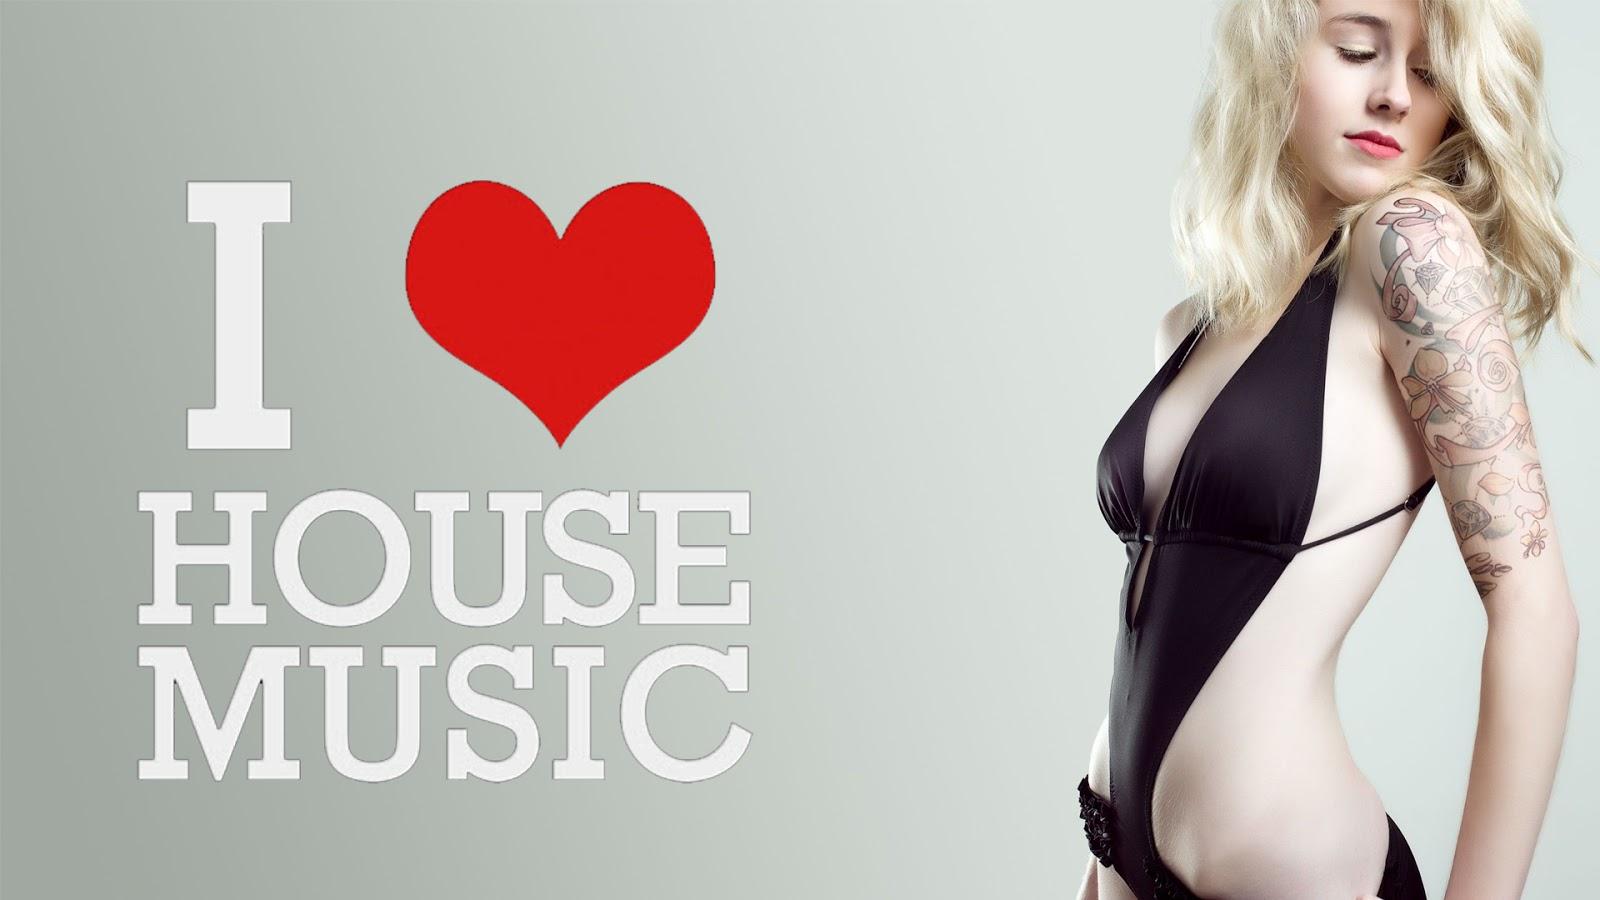 Top House Music 2020 List   Latest New House Songs 2020